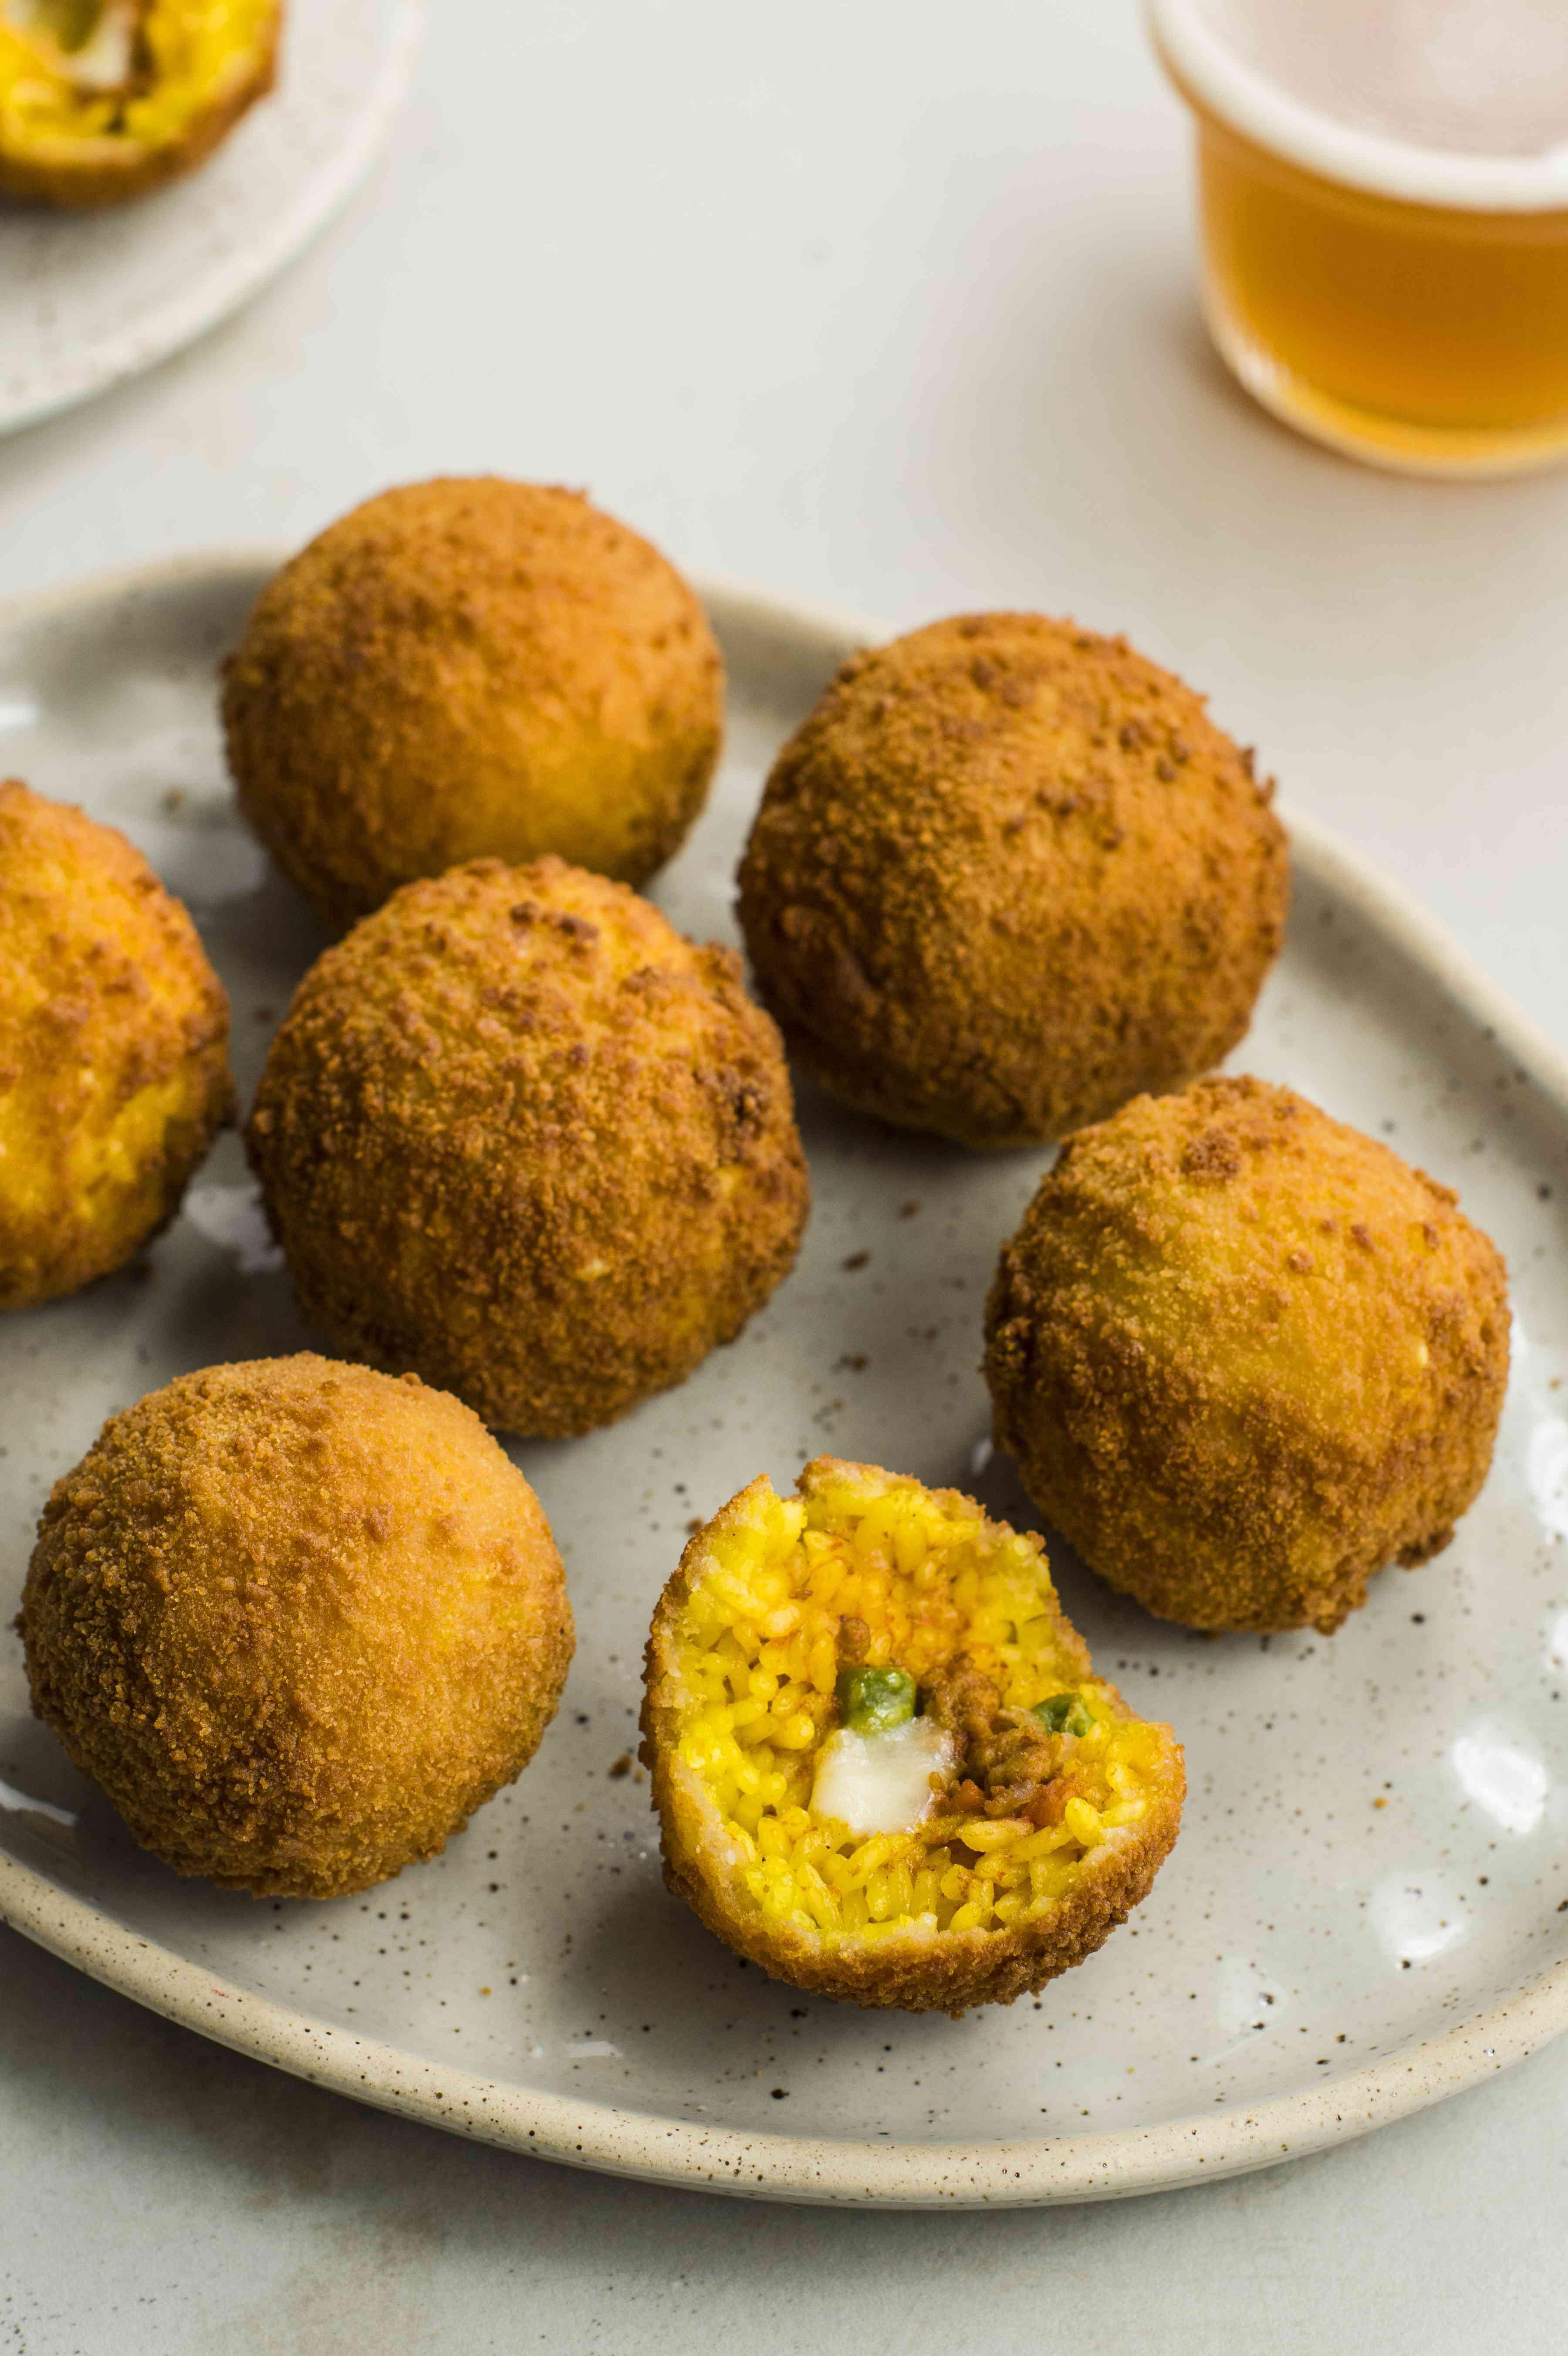 Classic Sicilian arancini rice balls